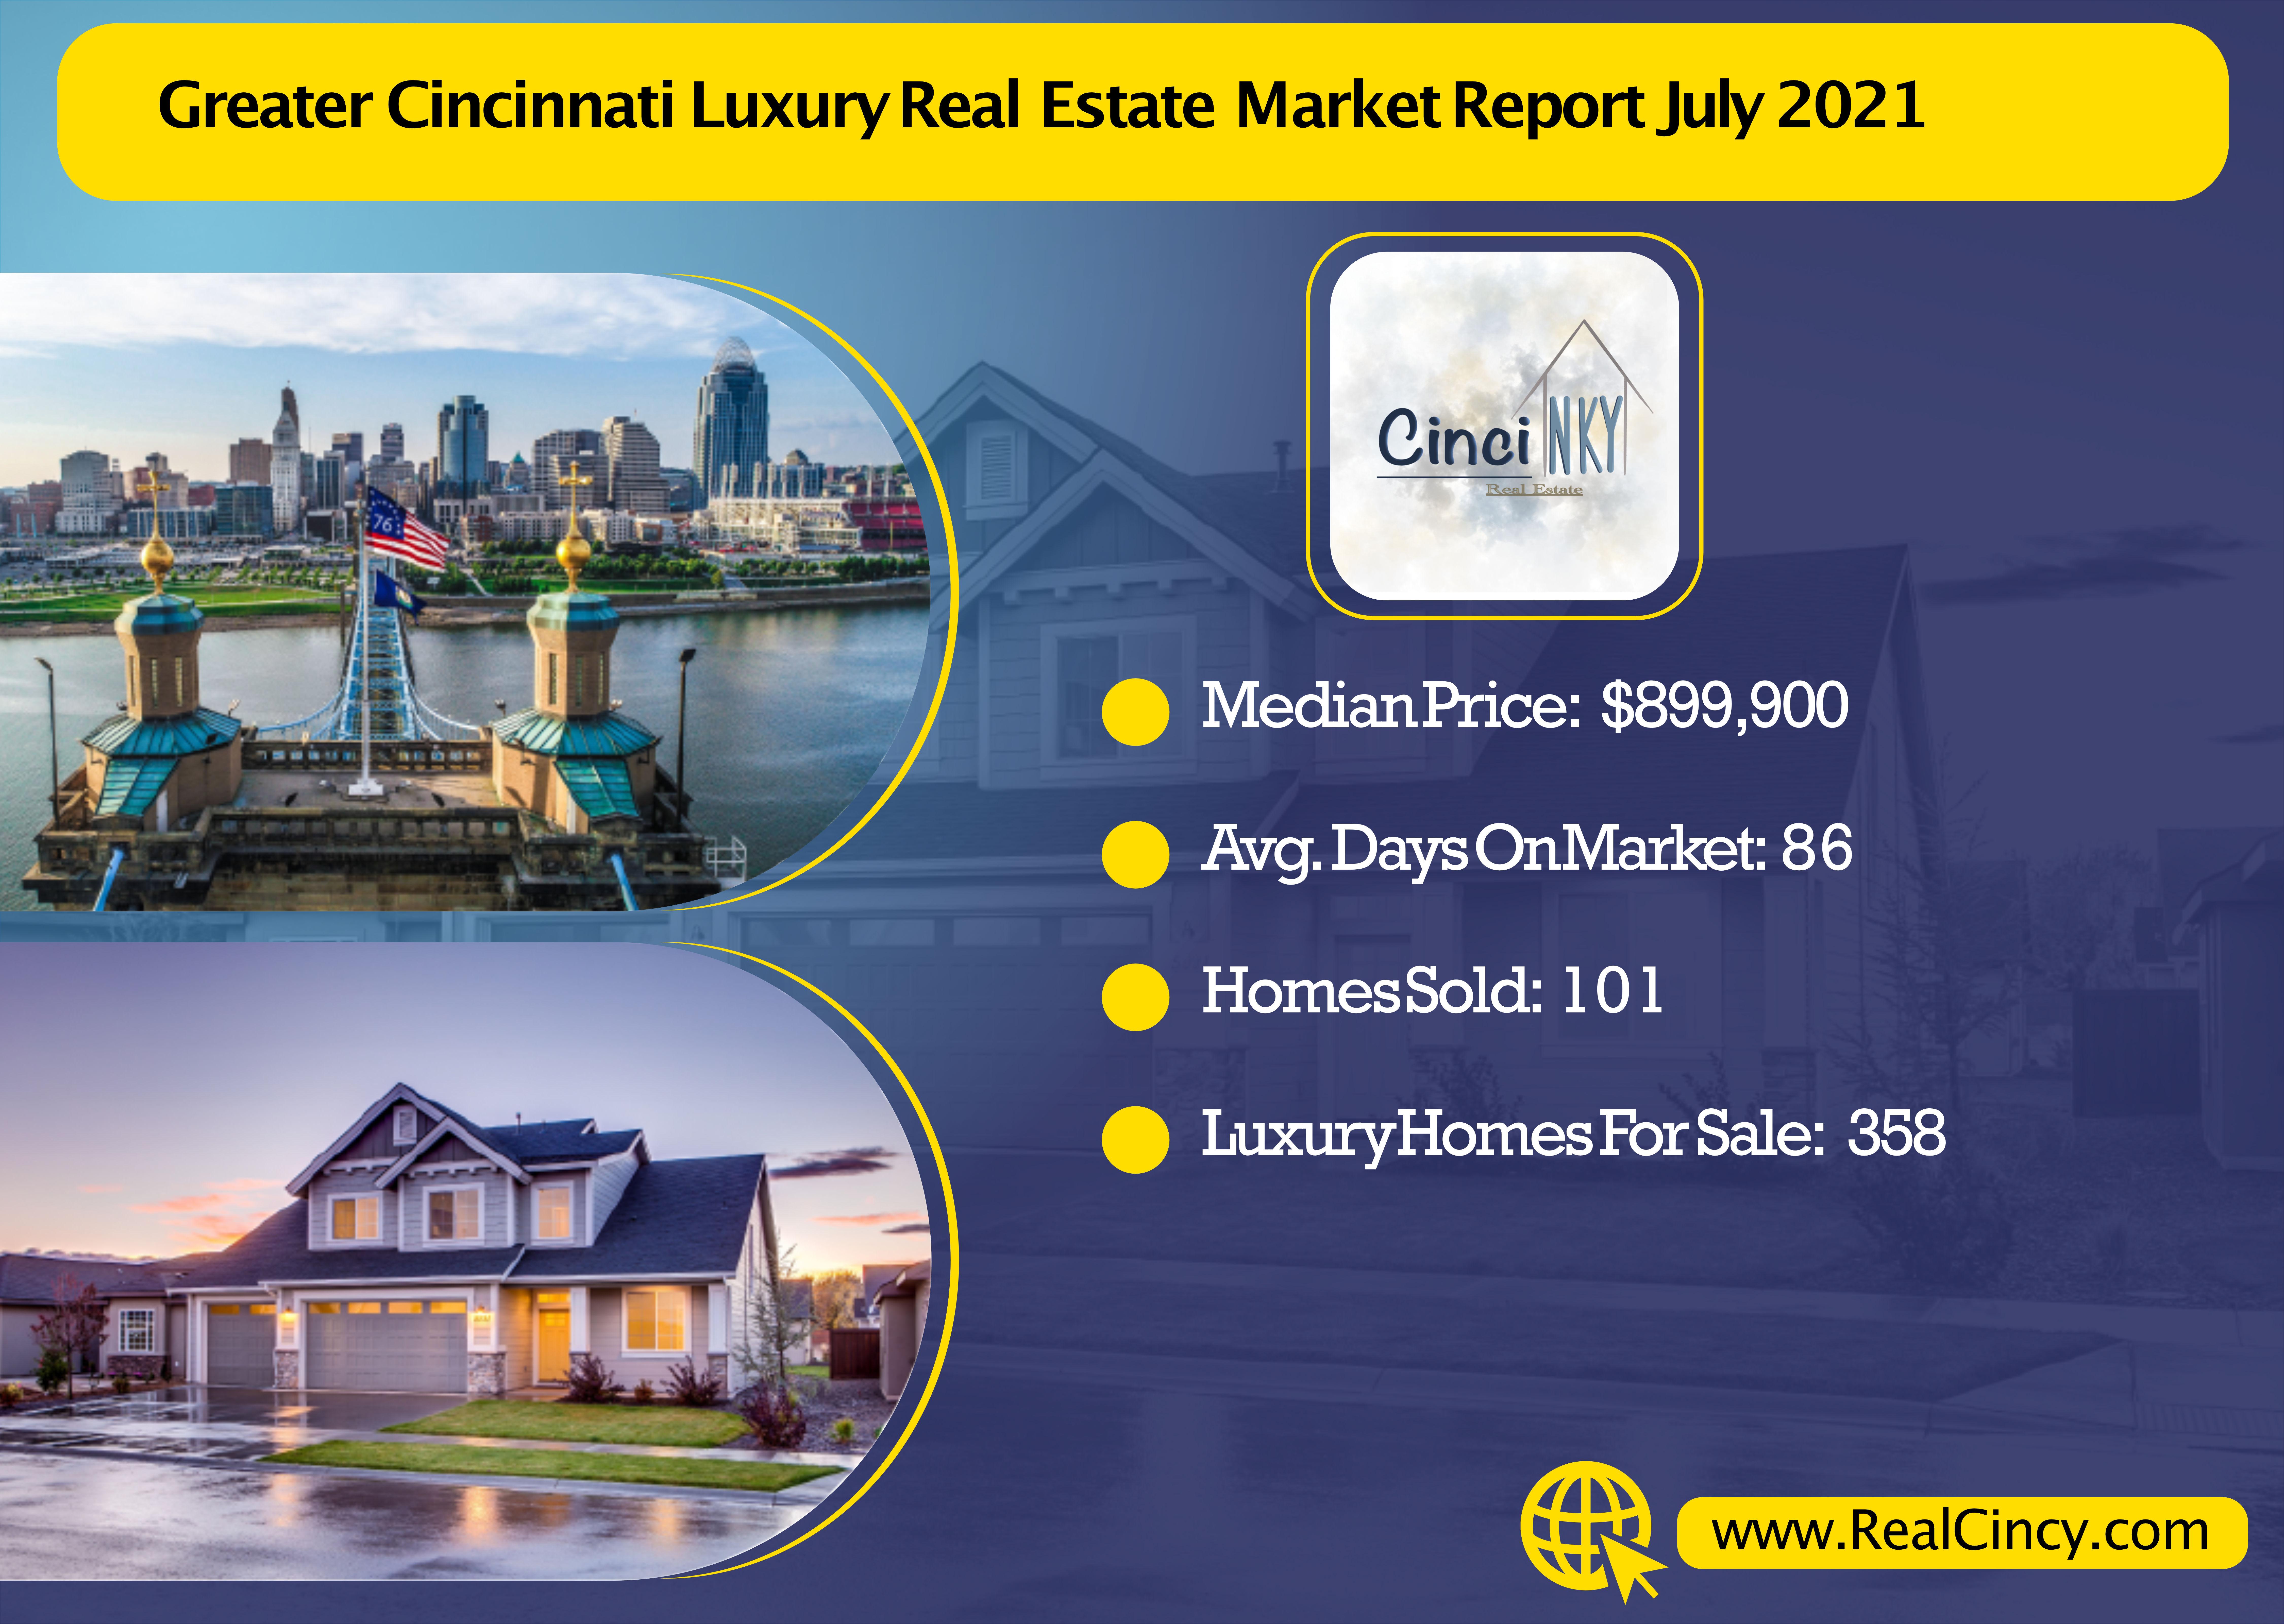 July 2021 Greater Cincinnati Luxury Real Estate Market Report